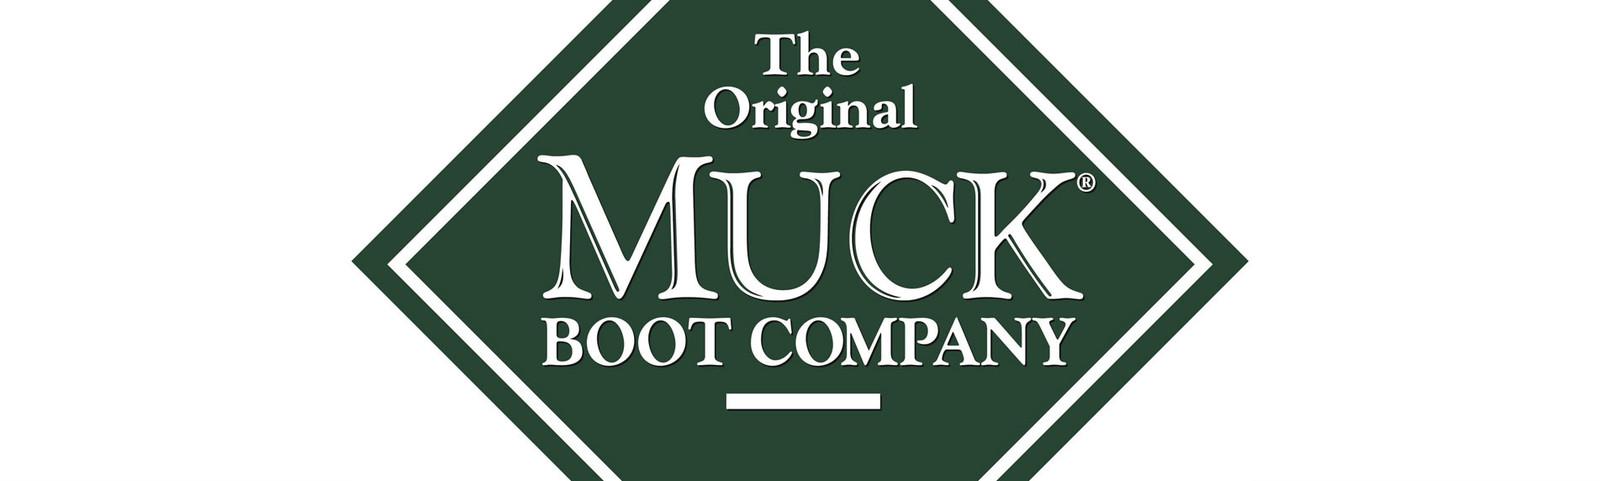 Muck® Boots